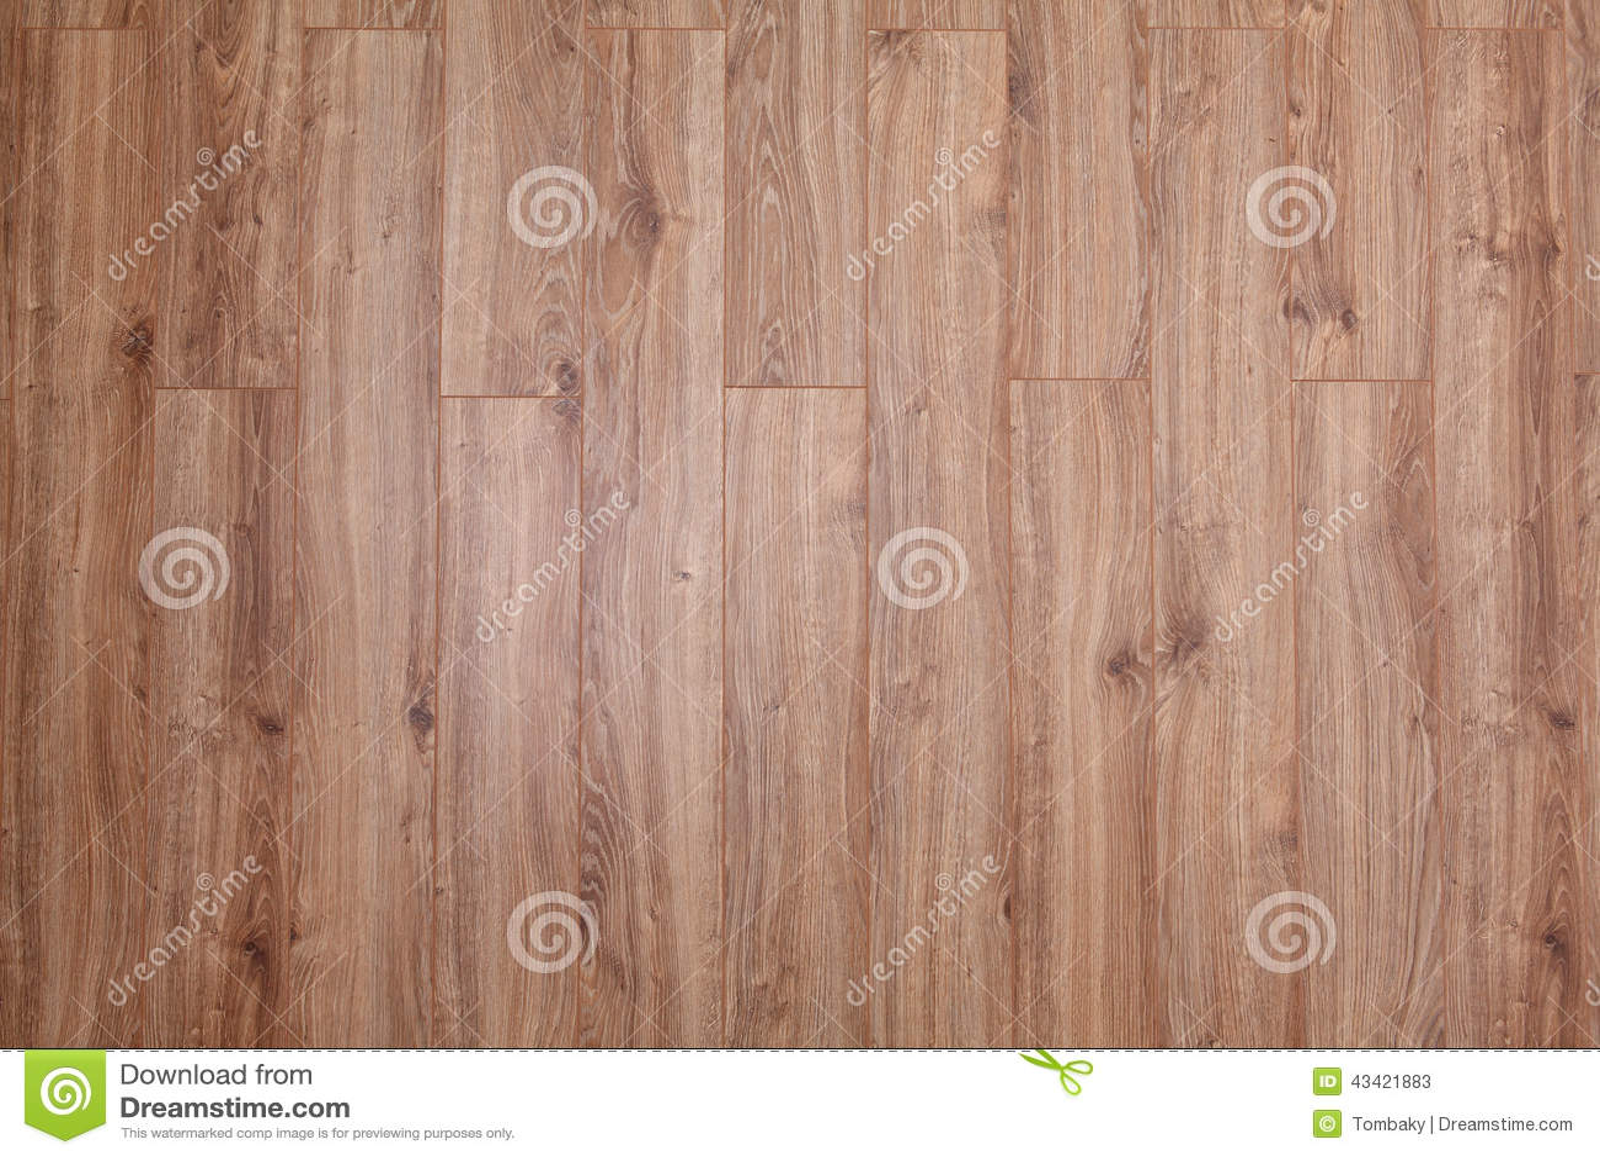 Wood Tile Texture Stock Photo Image 43421883